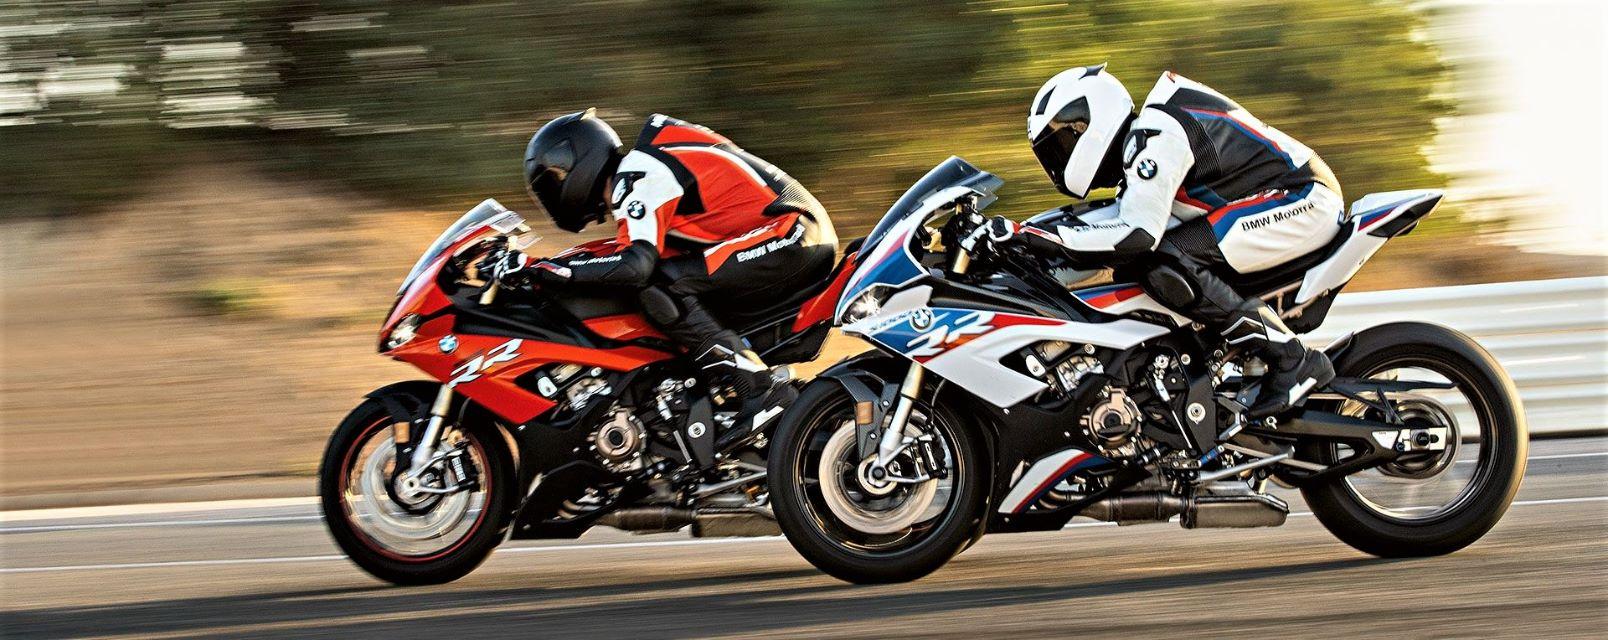 Texas BMW Motorcycle Dealership | Boerne, TX New & Used